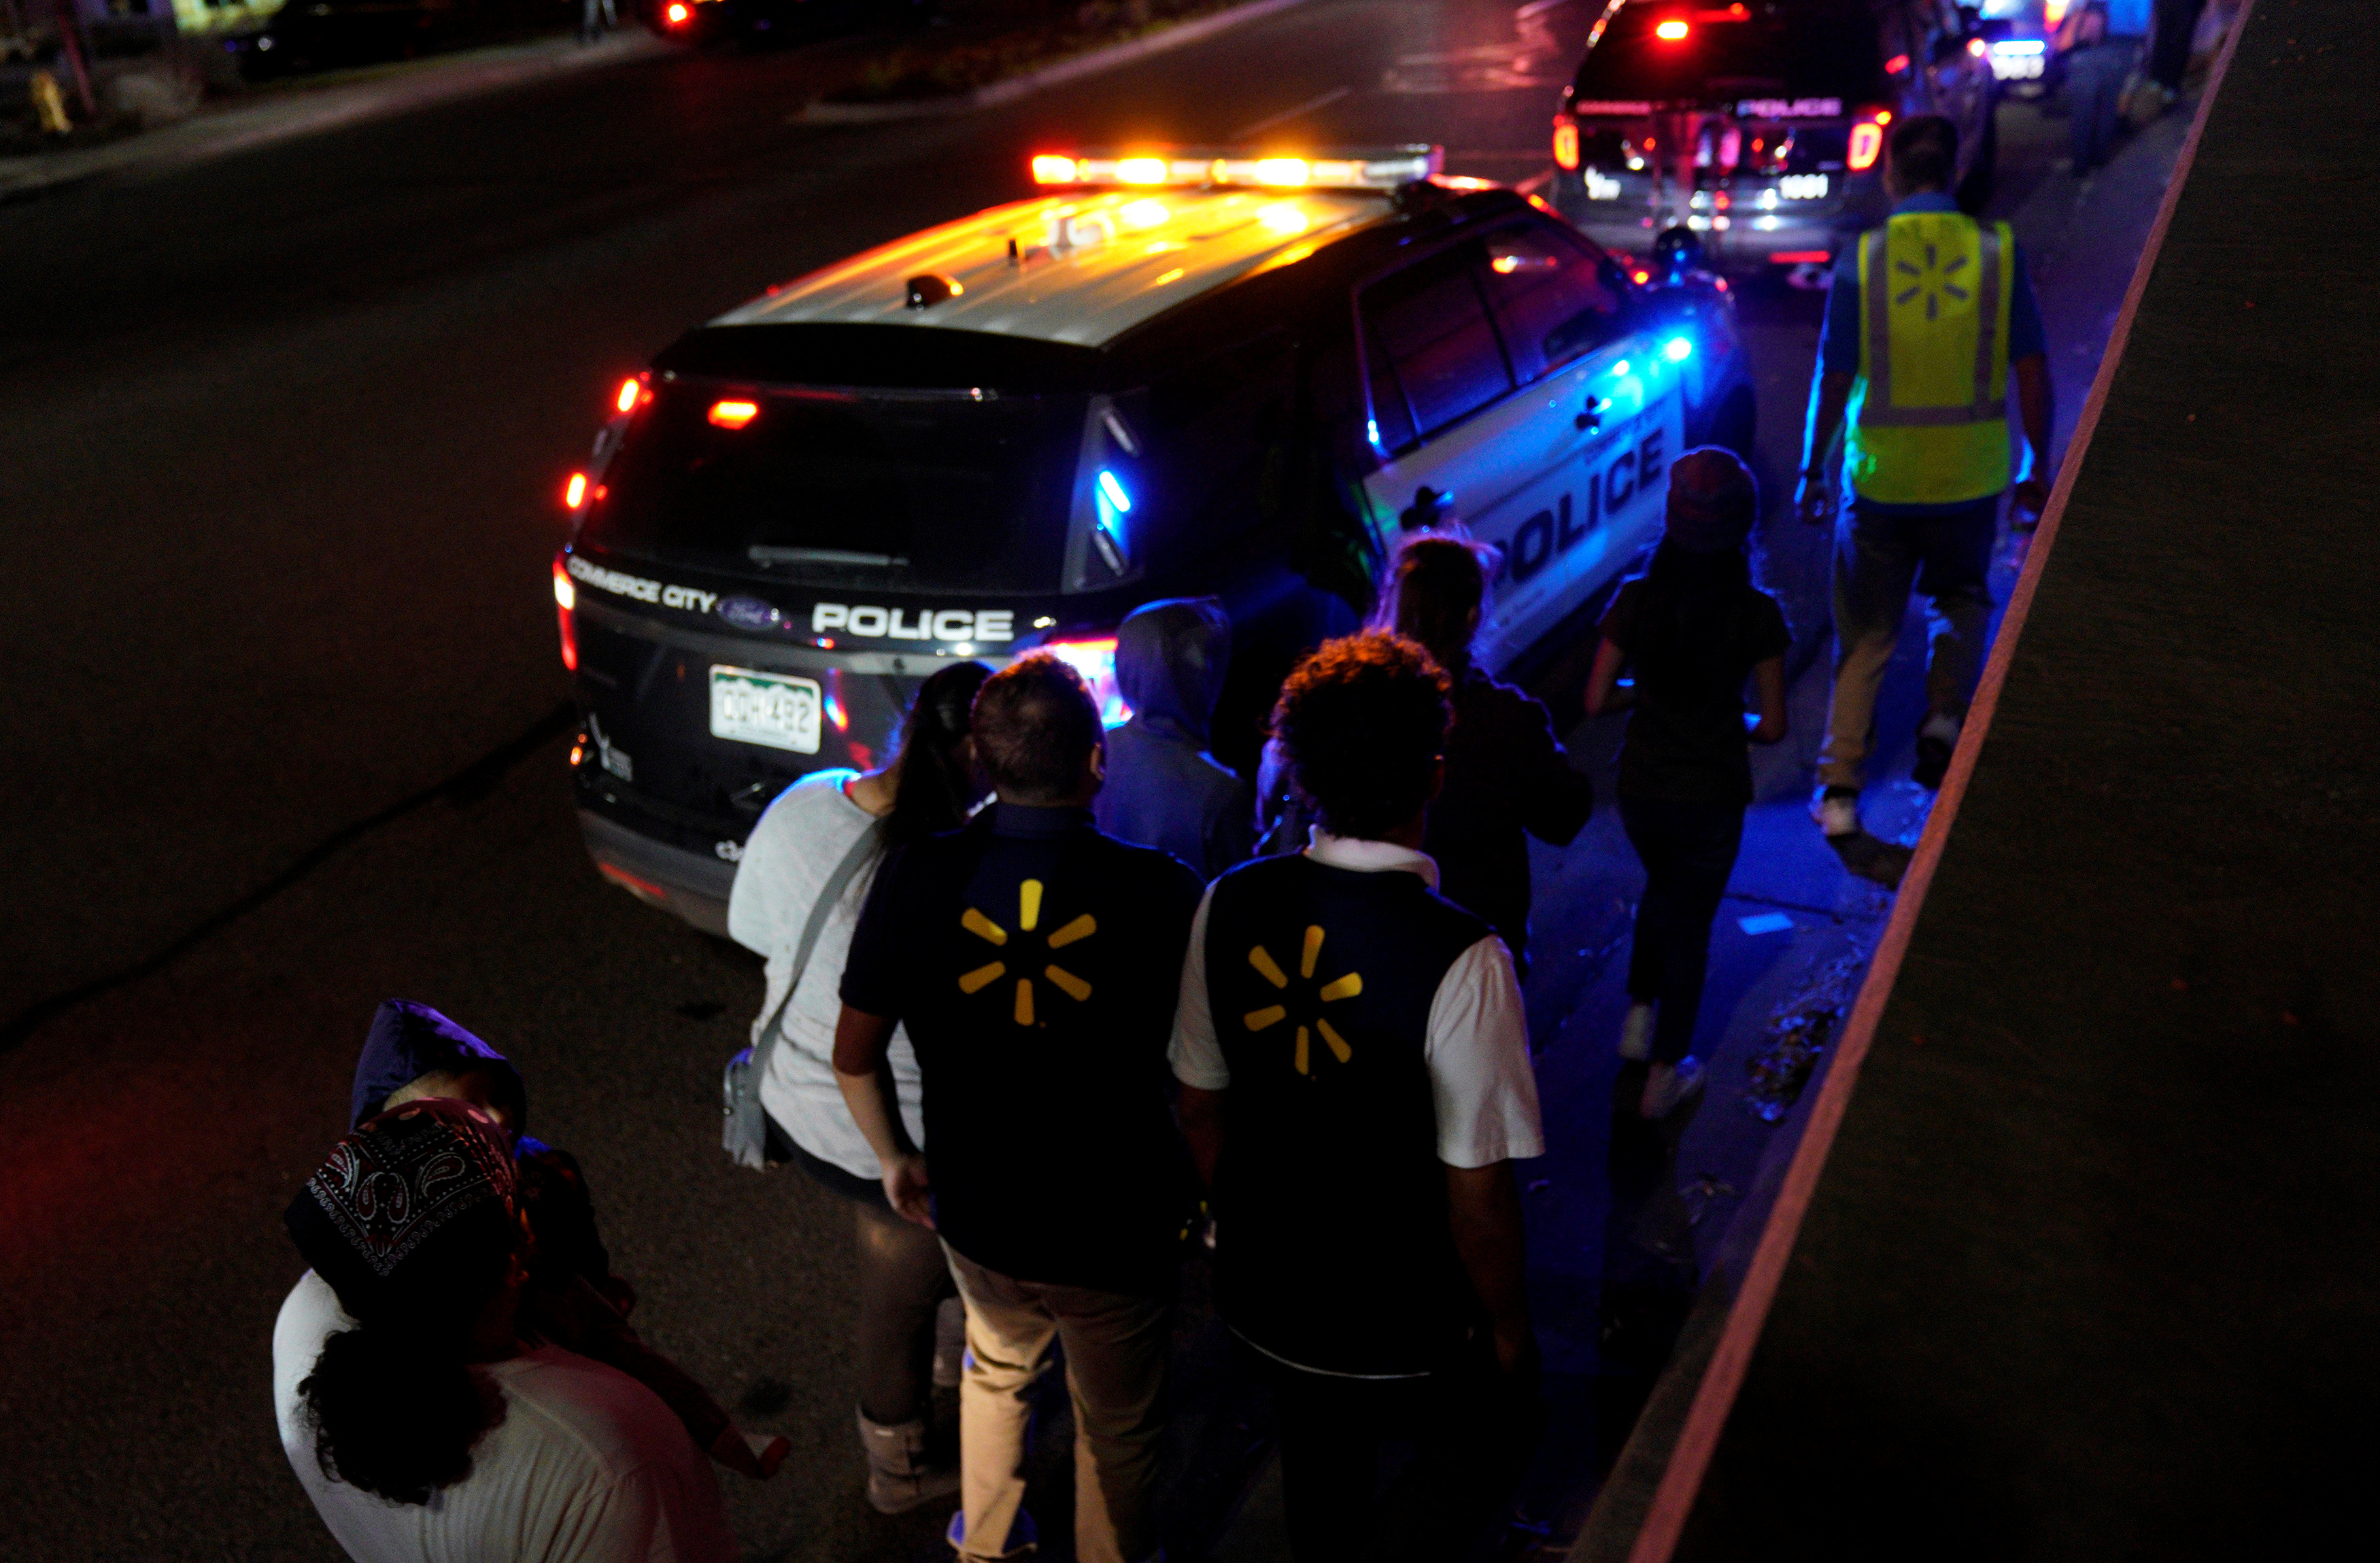 Tiroteo en Walmart de Colorado deja múltiples heridos